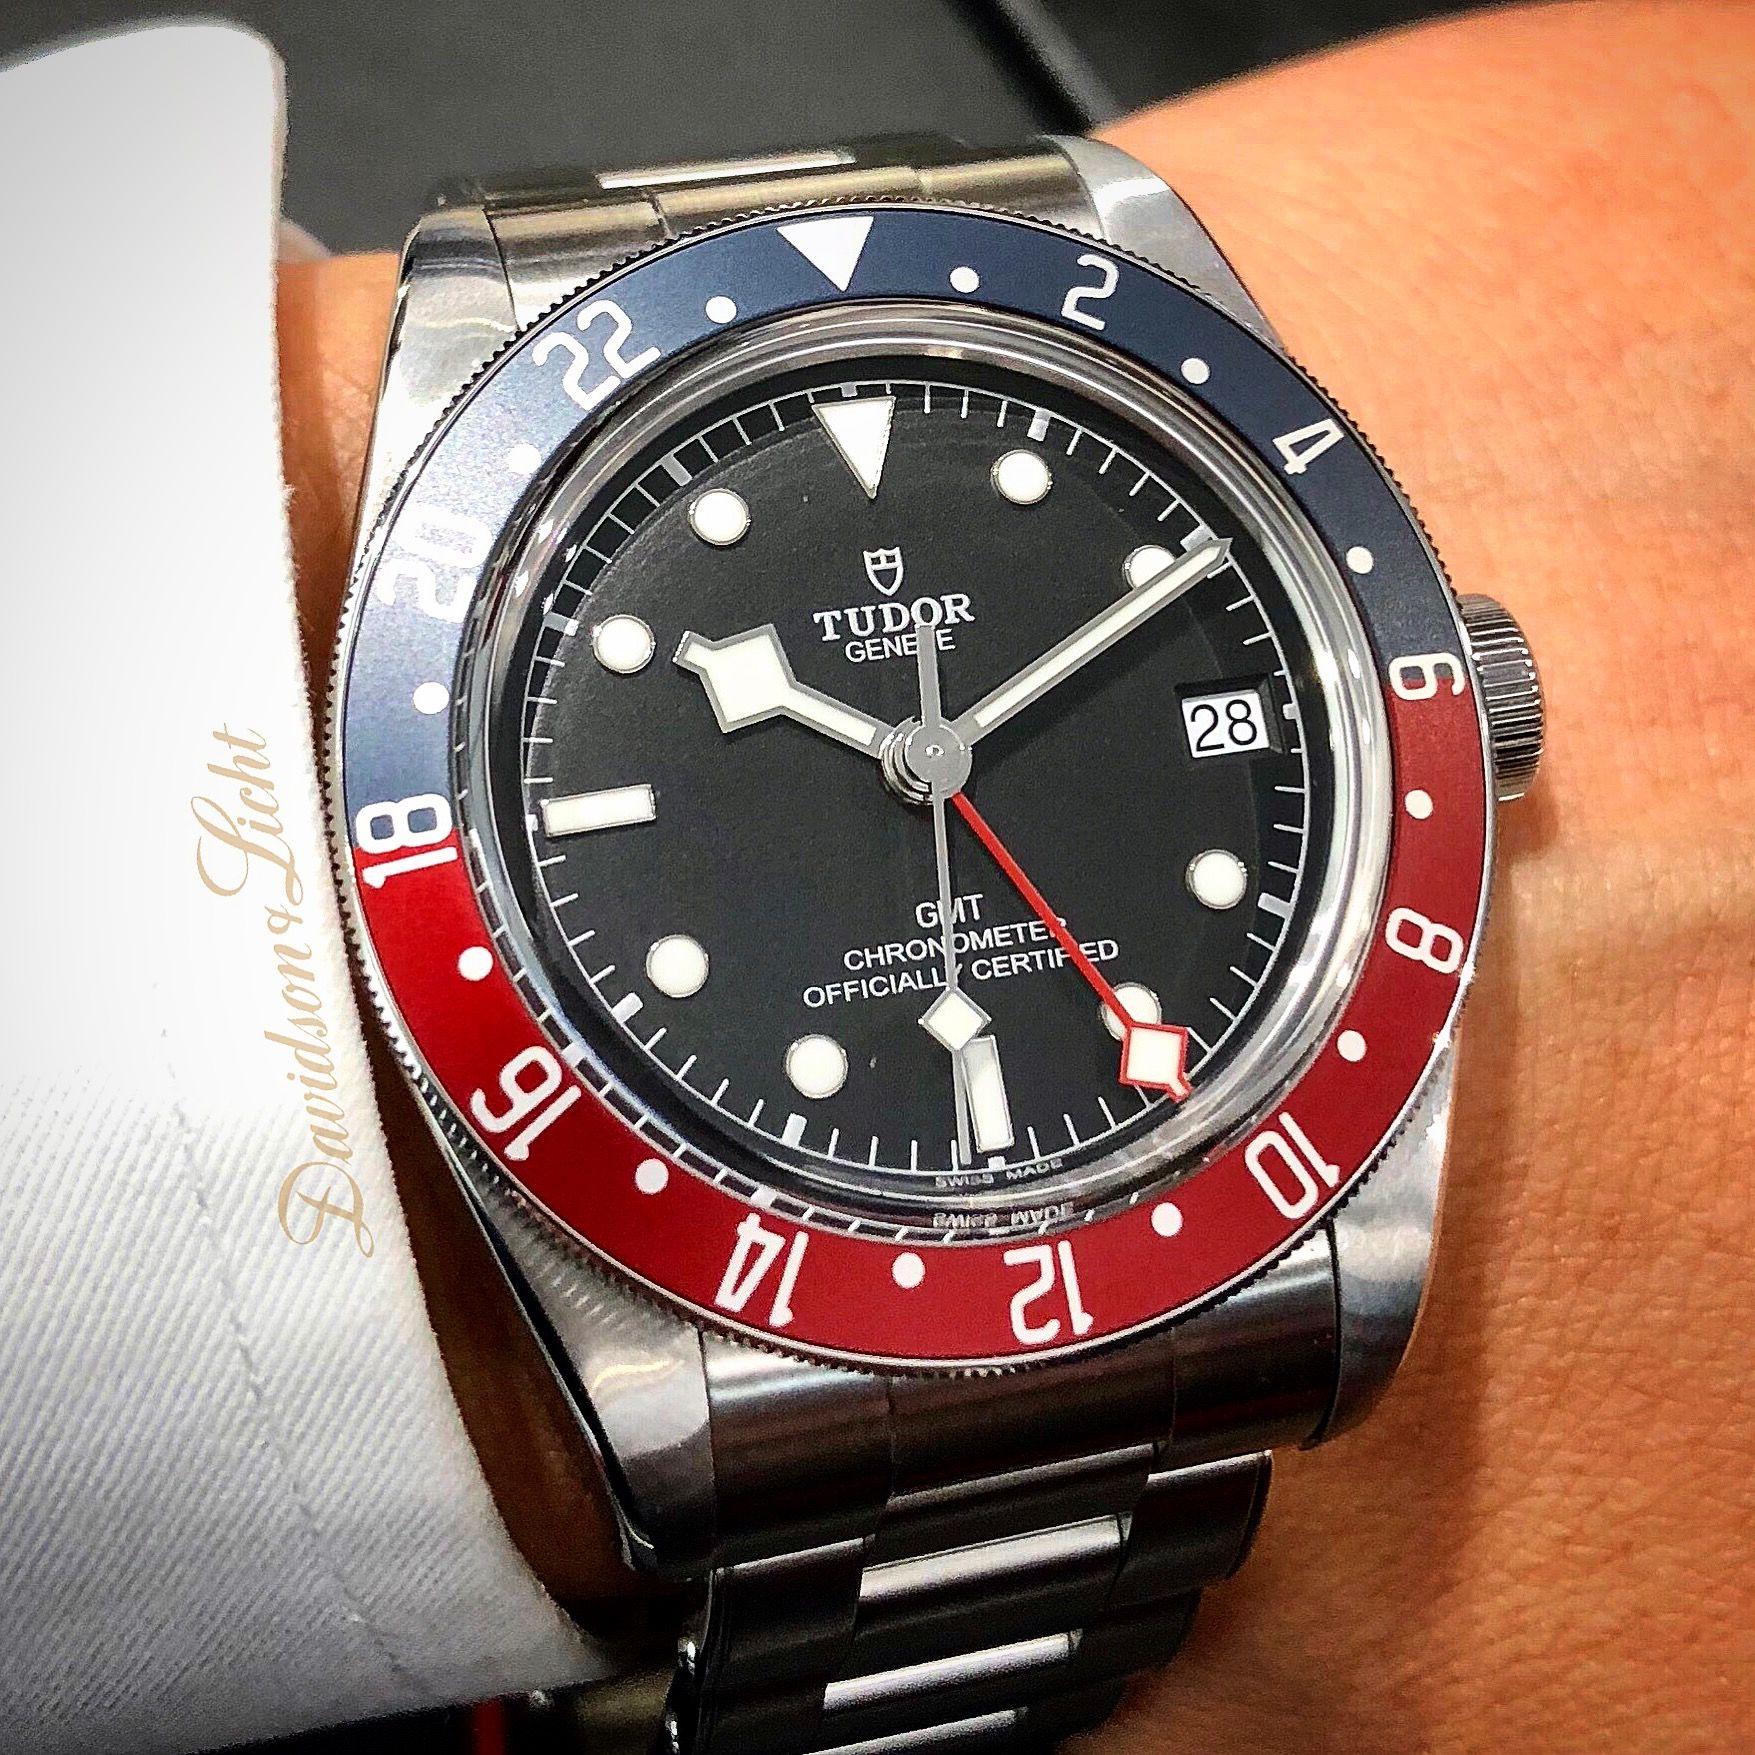 Tudor Black Bay Gmt Quot Pepsi Quot Bezel Automatic Watch M79830rb